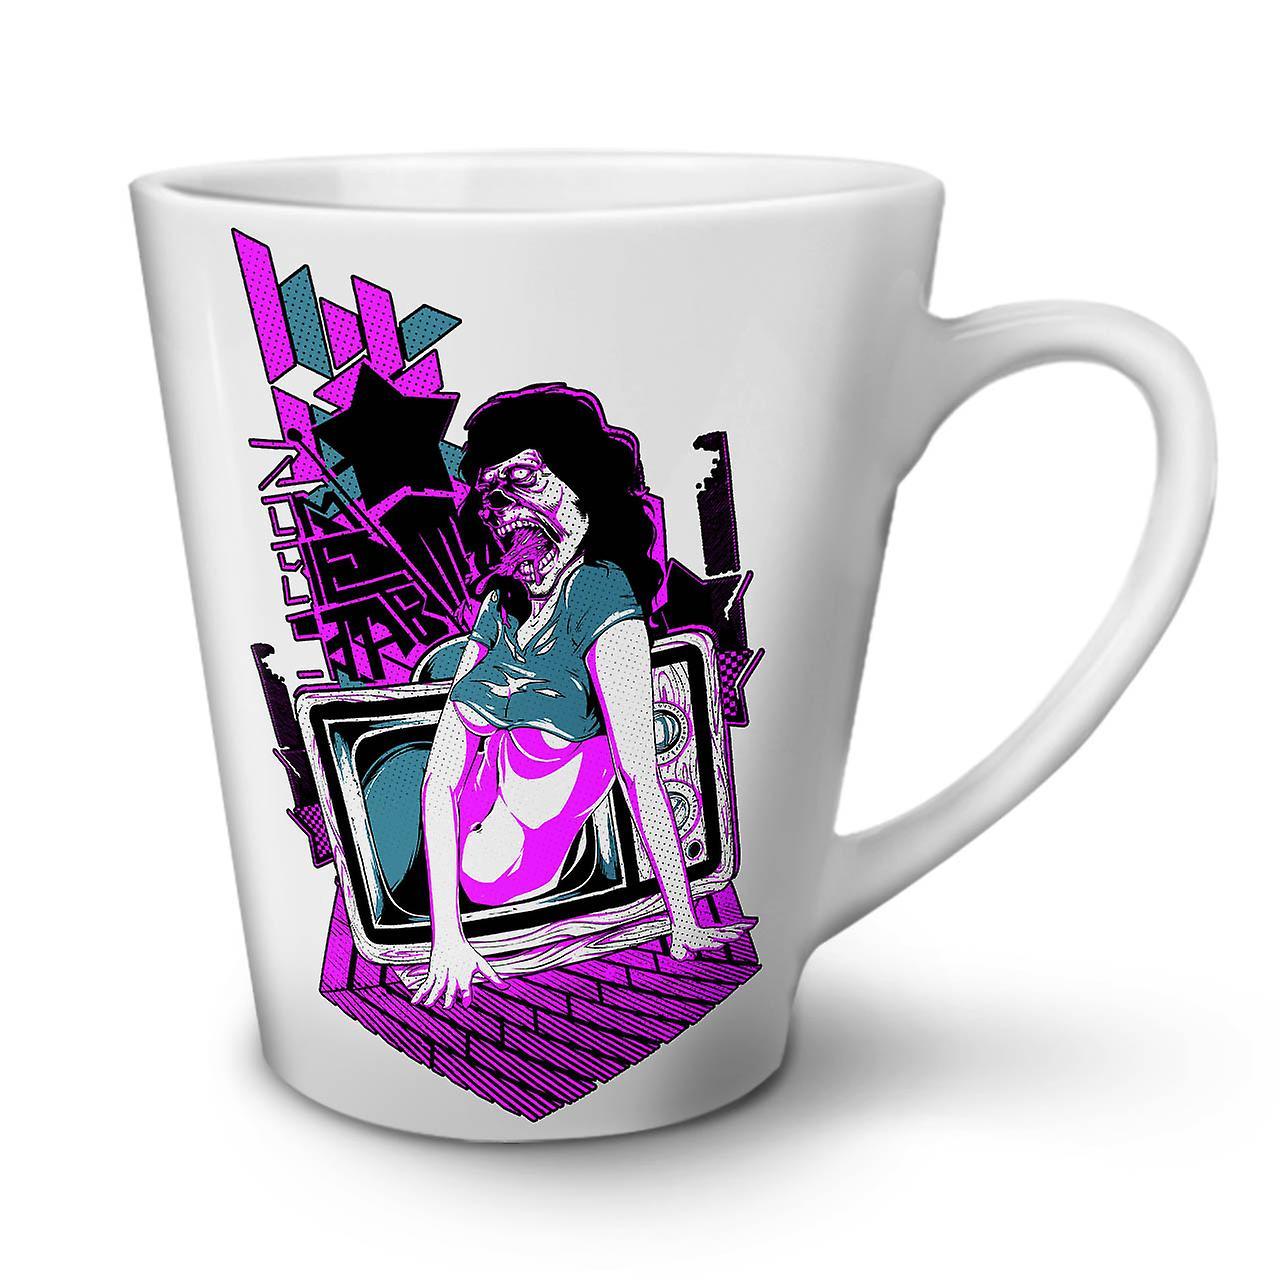 Girl Art 12 En Zombie Thé Café Nouveau Blanc Mug Latte Dead Céramique OzWellcoda Tv rdsBChxotQ